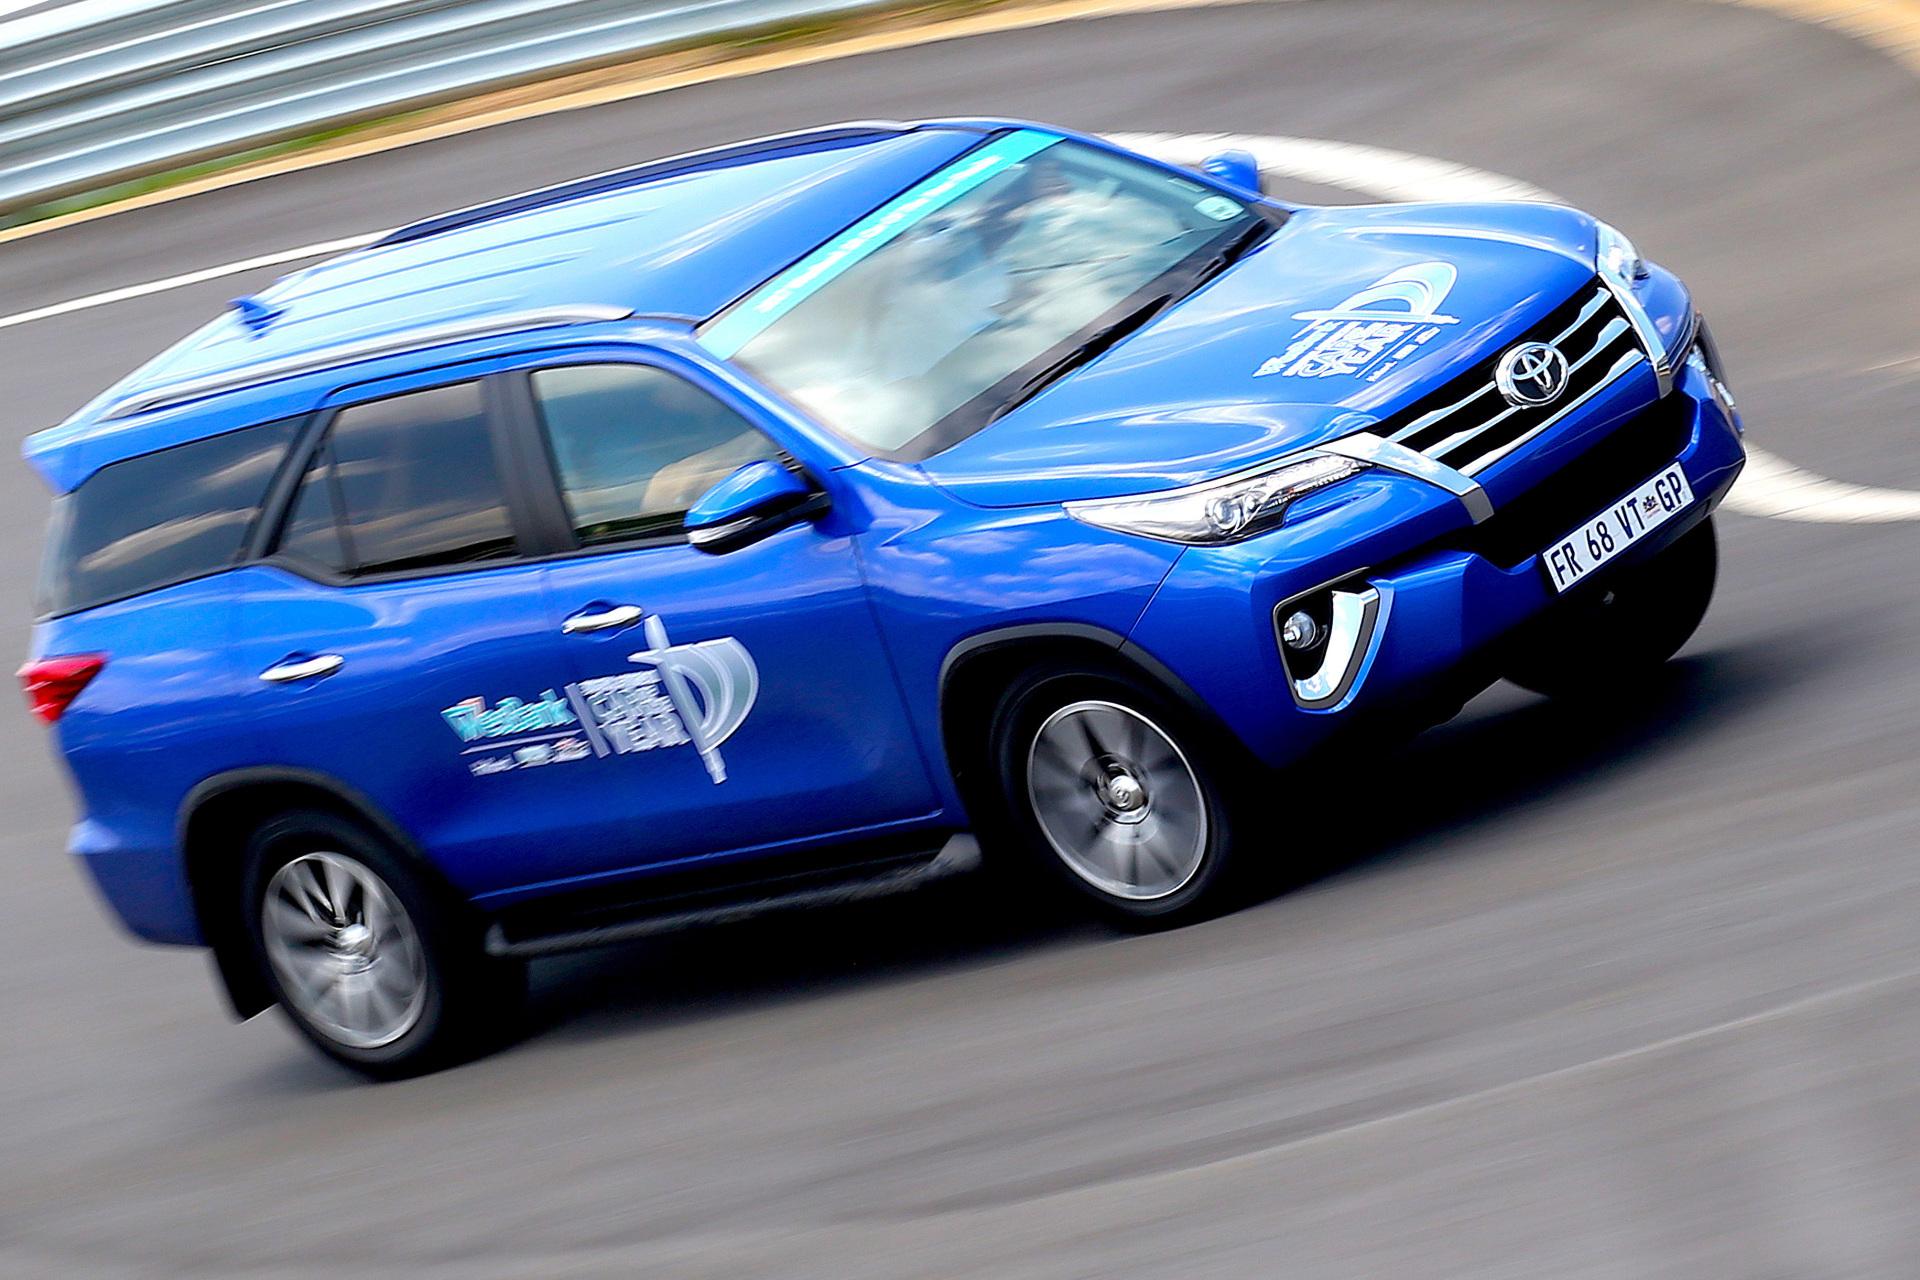 Toyota Fortuner 2.8 GD-6. Image - Inge Hendricks